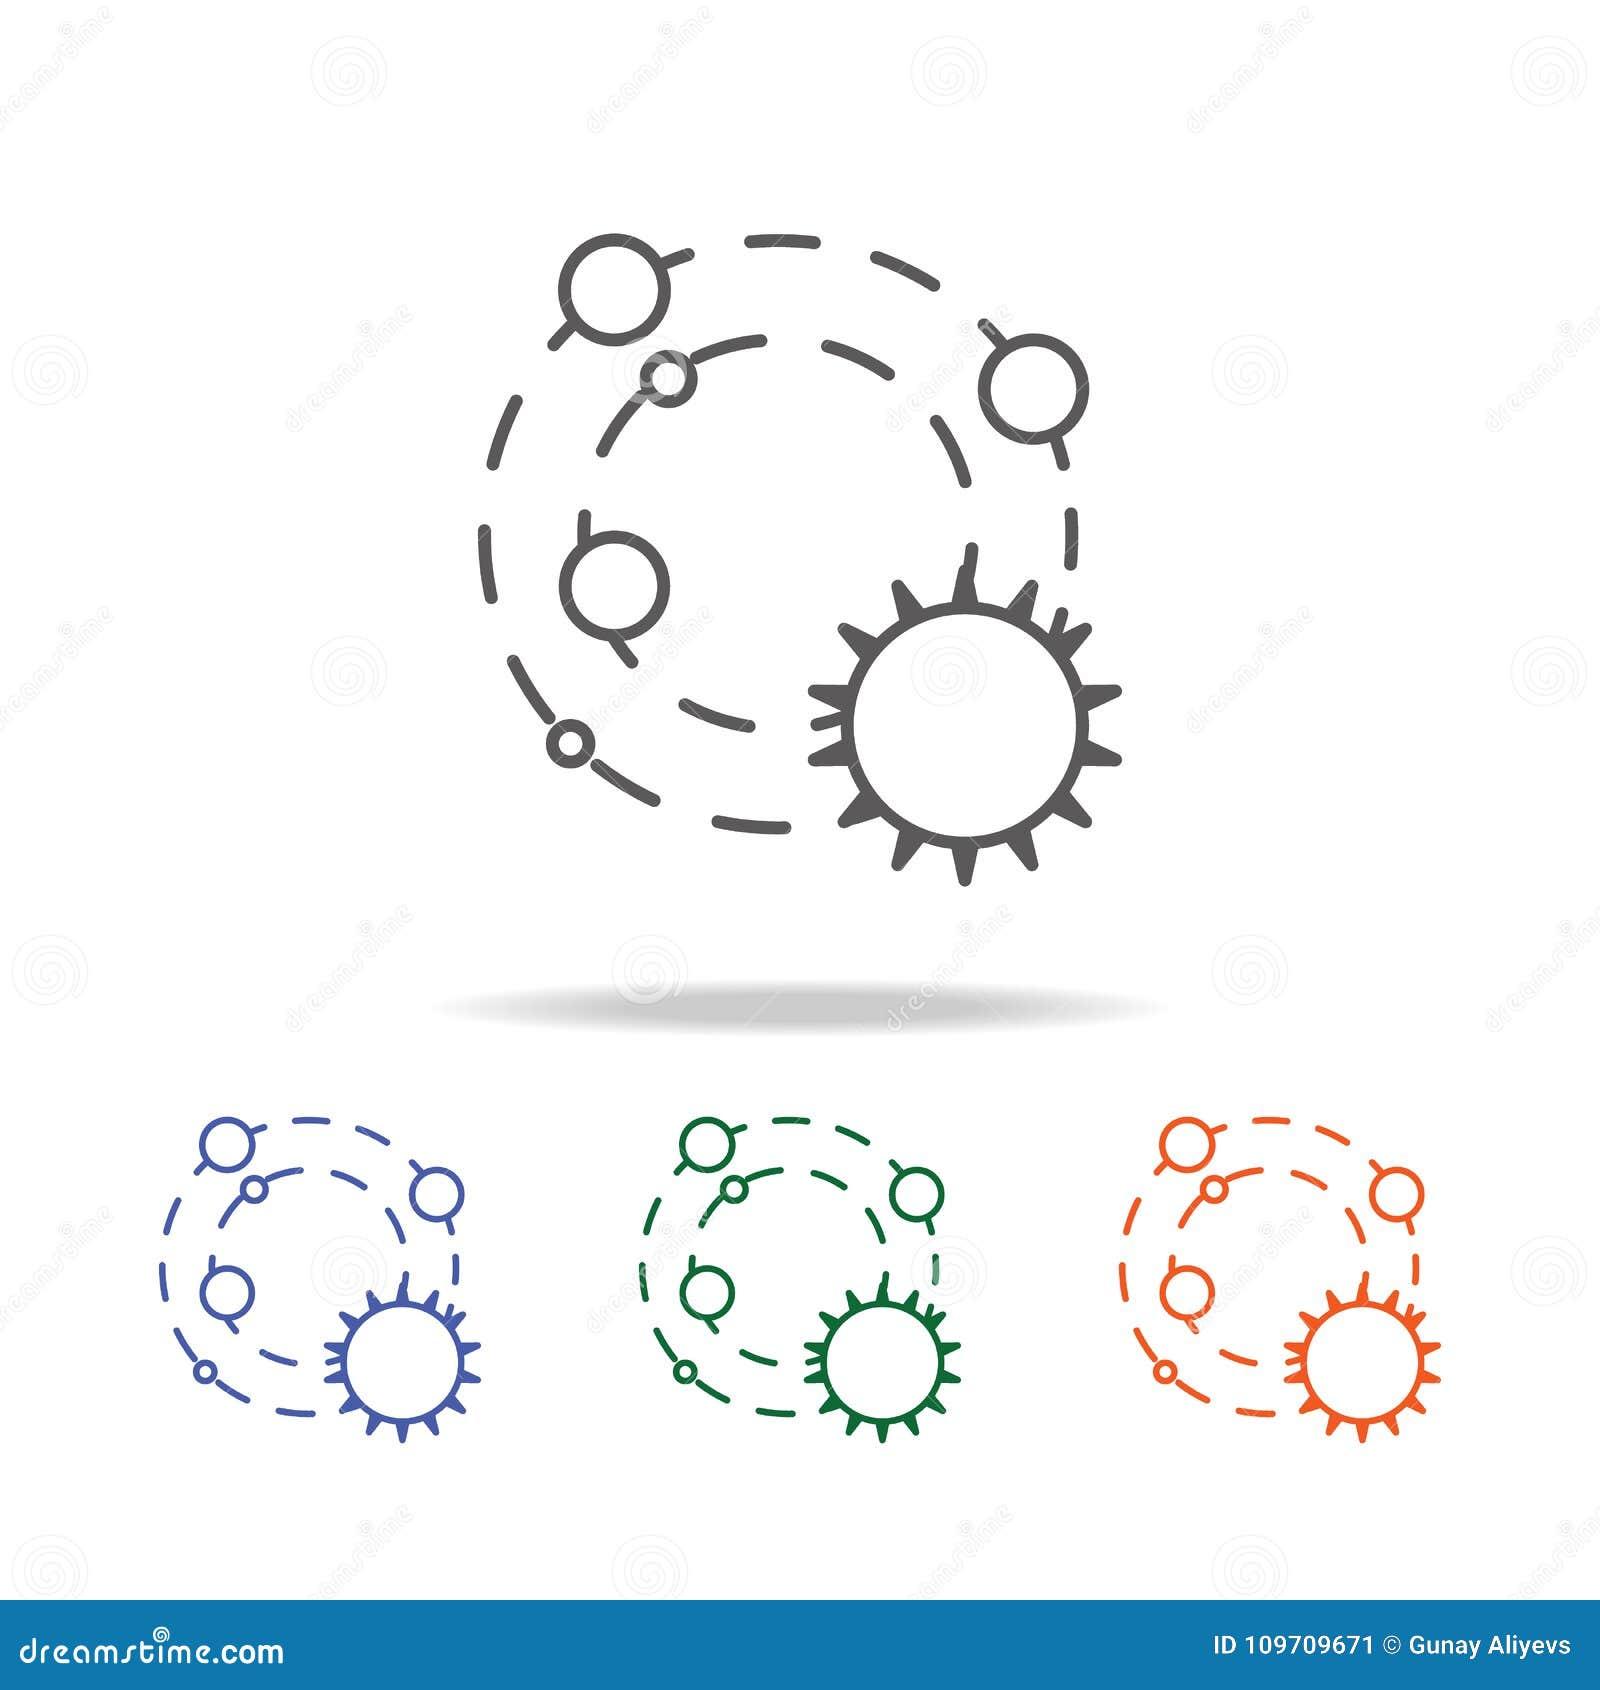 spiral development model royalty